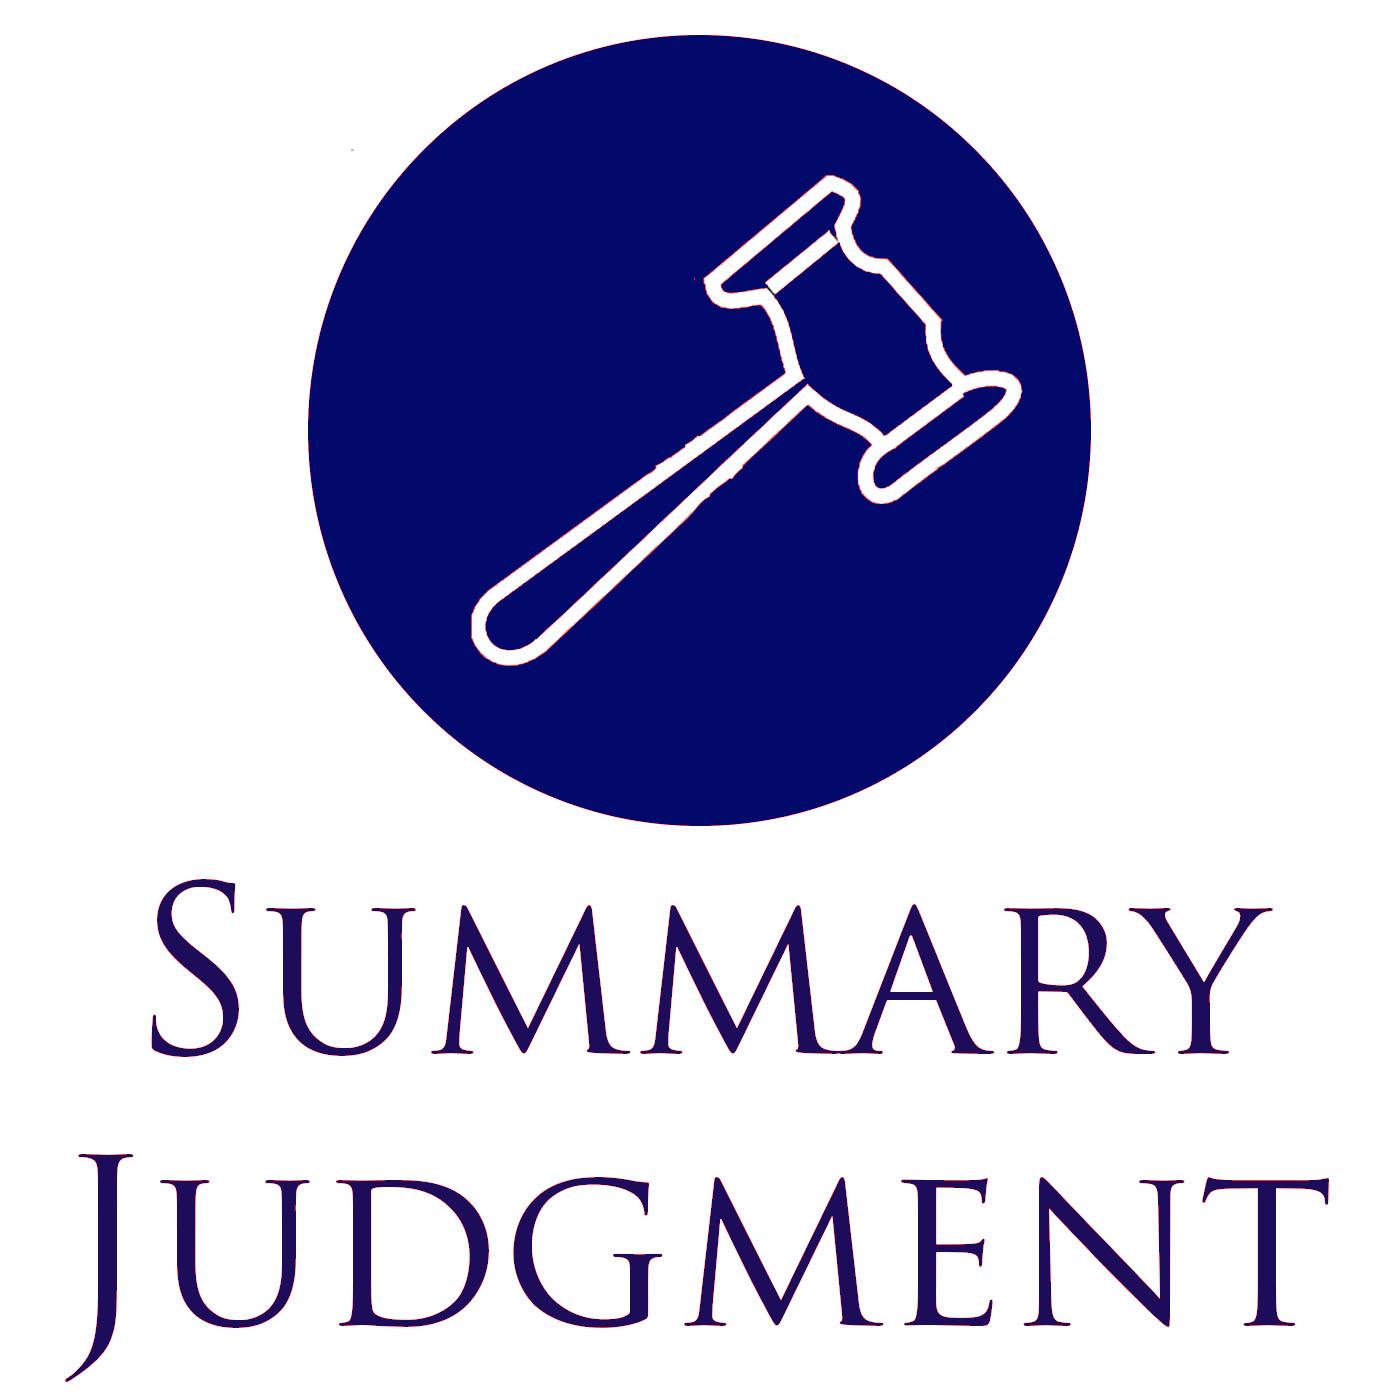 Summary Judgment | Listen via Stitcher for Podcasts